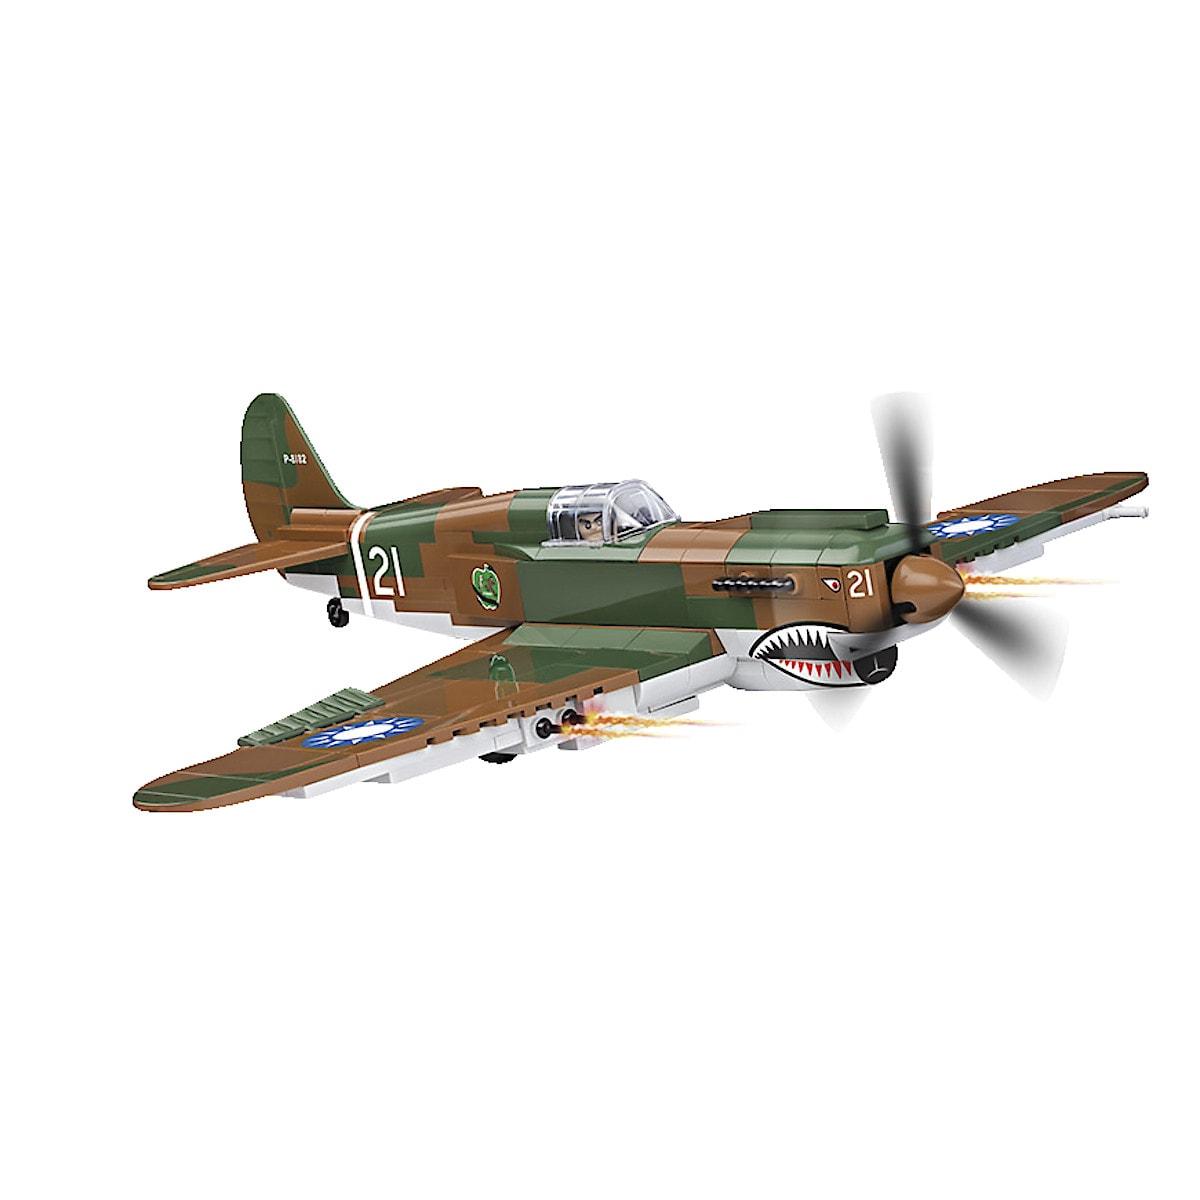 Cobi byggeklosser Curtiss P-40B Tomahawk